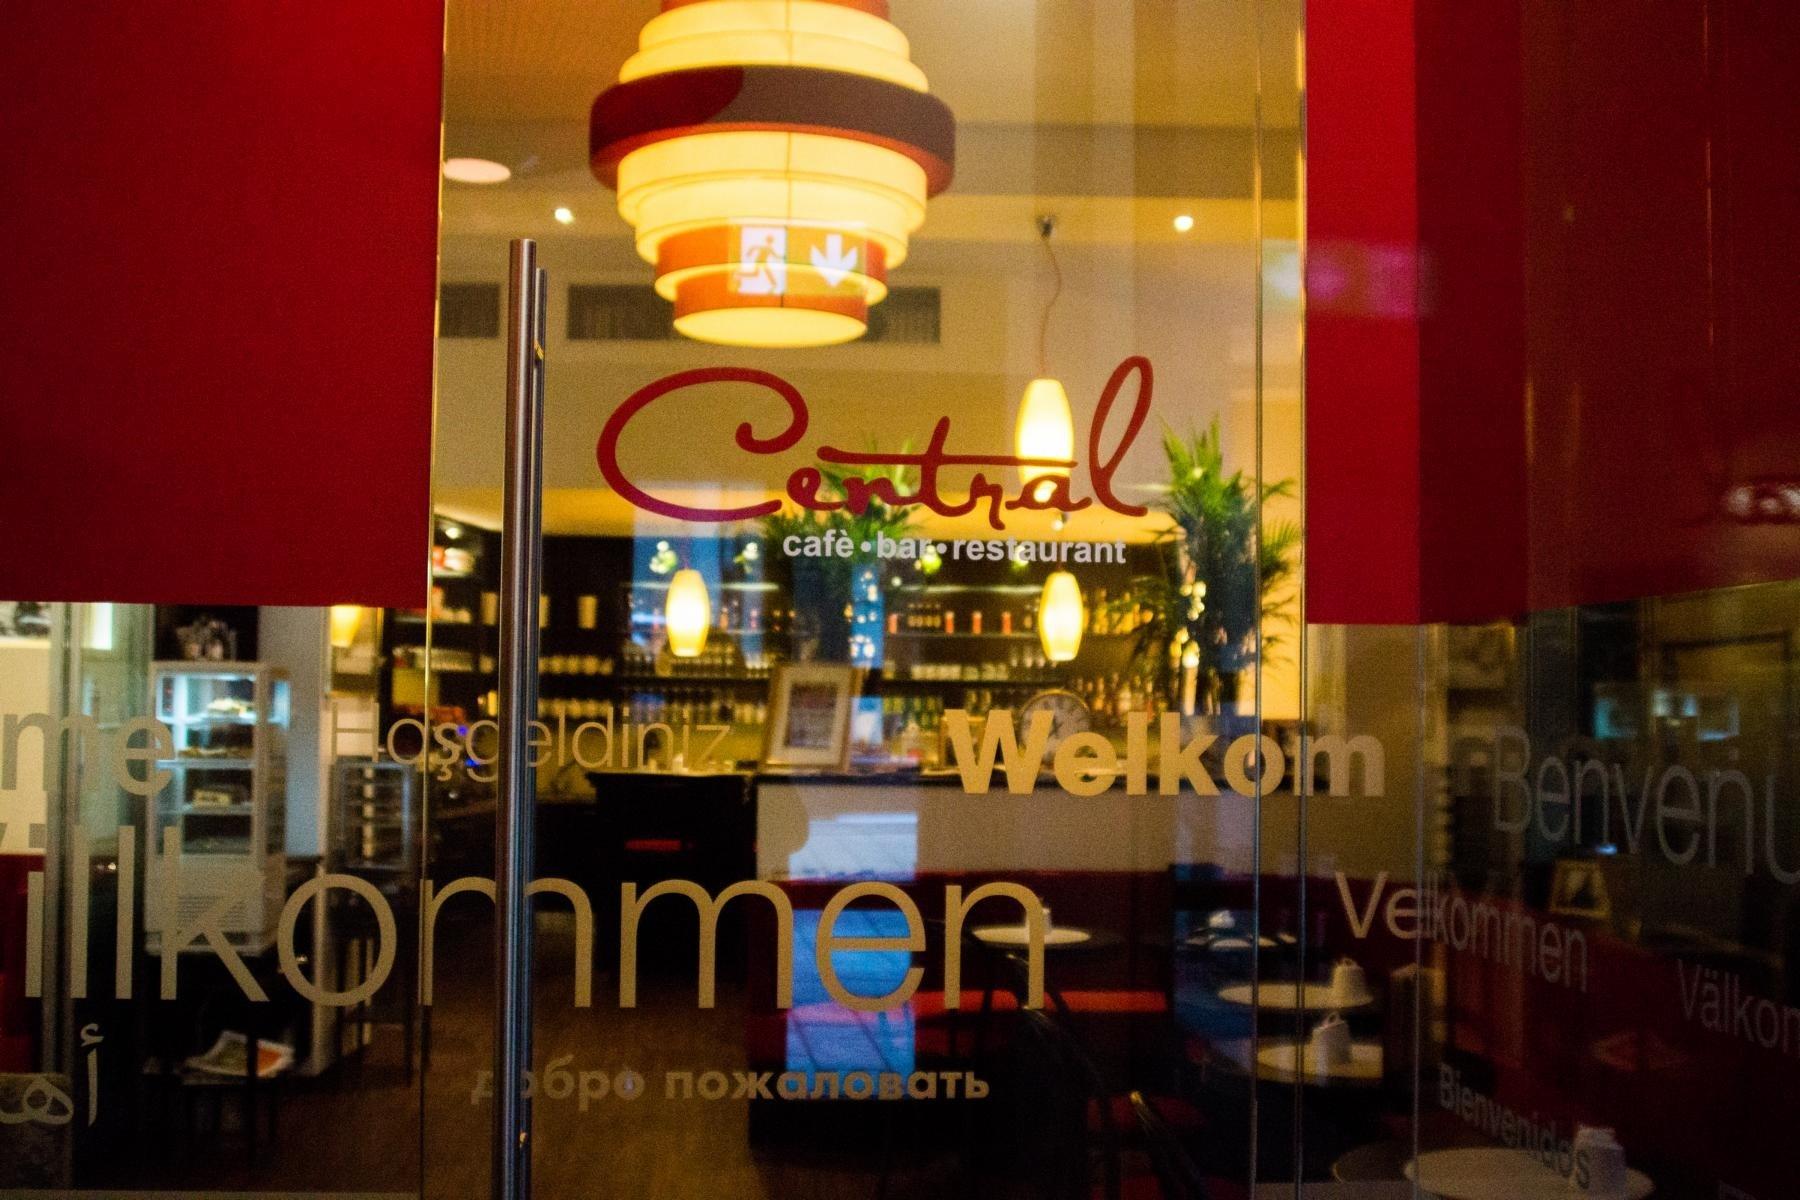 blick-vom-eingang Incroyable De Table Bar Cuisine Conception